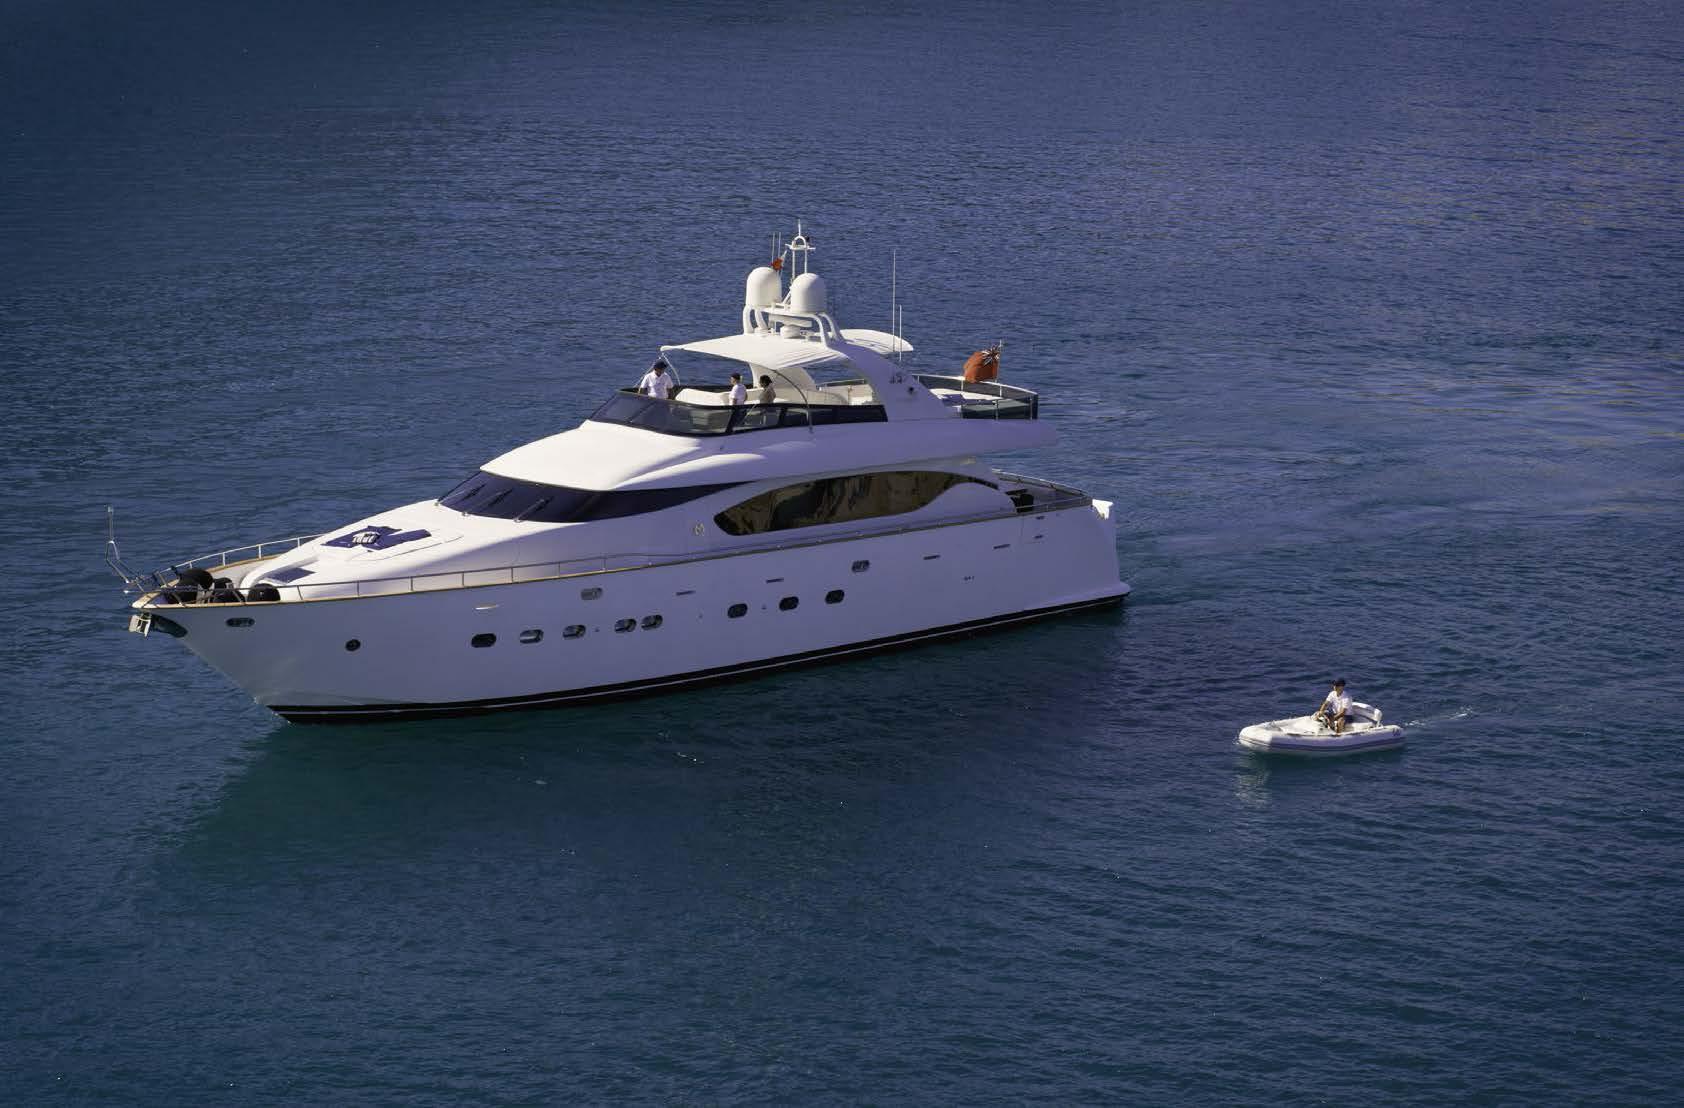 Luxury yacht MEME - Built by Maiora